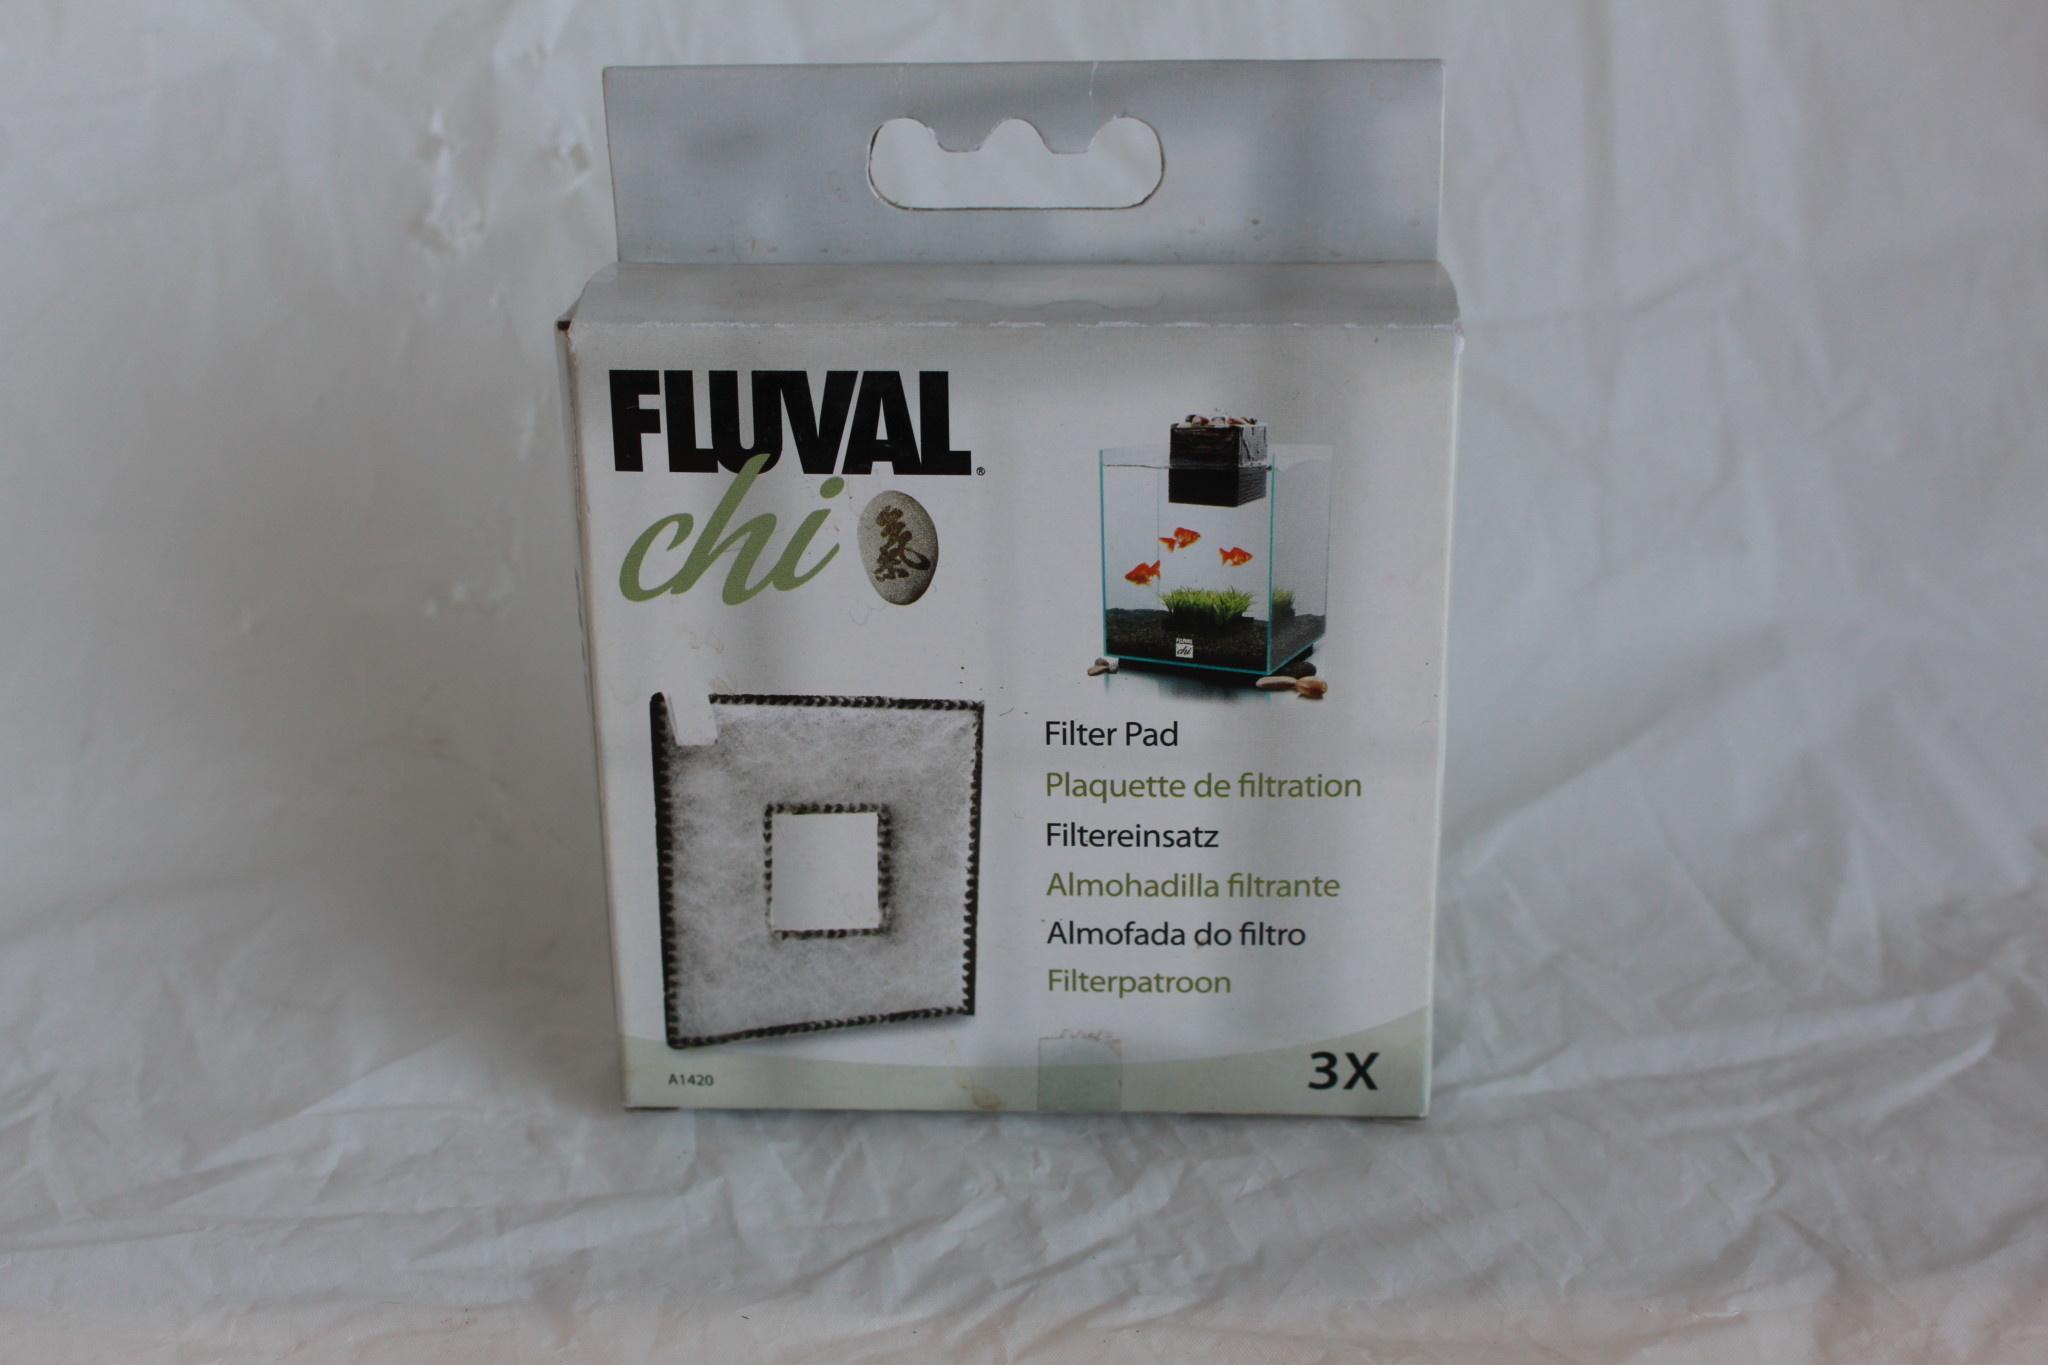 Filter Pad for Fluval Chi 3-pack-2